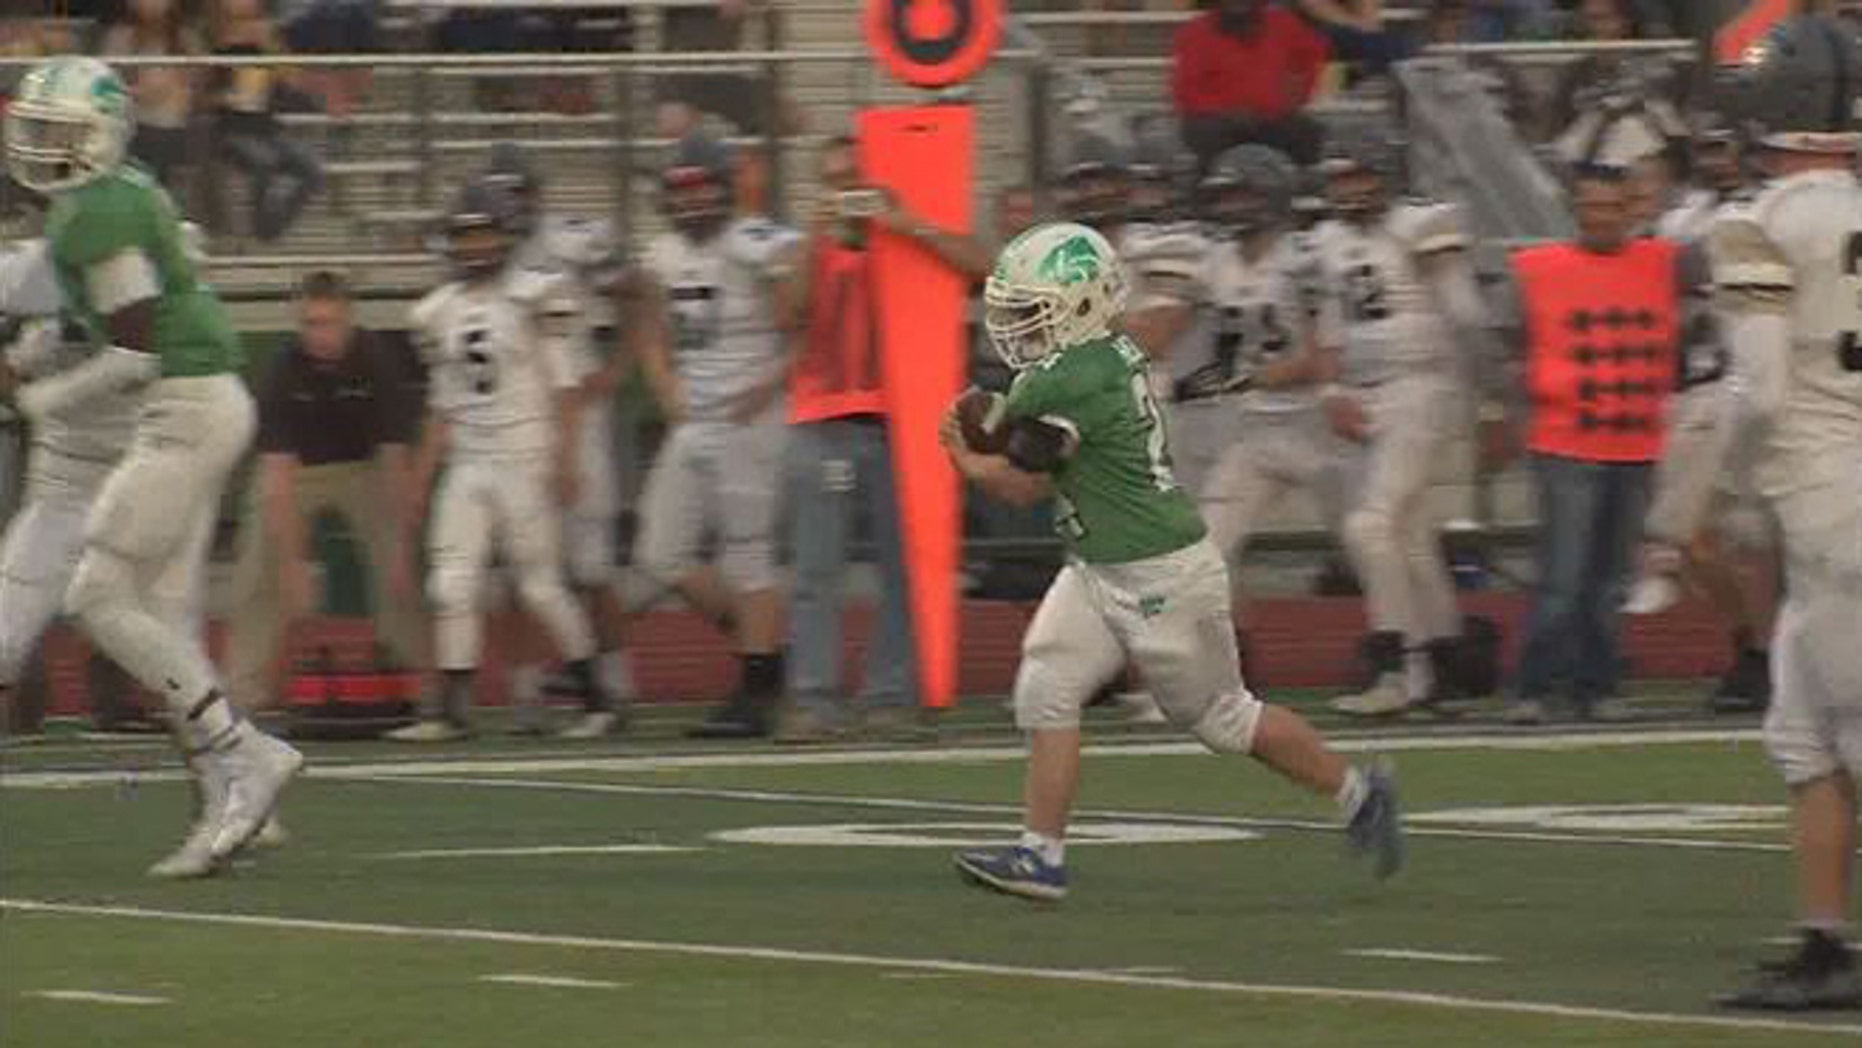 Robby Heil scoring touchdown for Novi High School Friday. (Fox 2 Detroit)